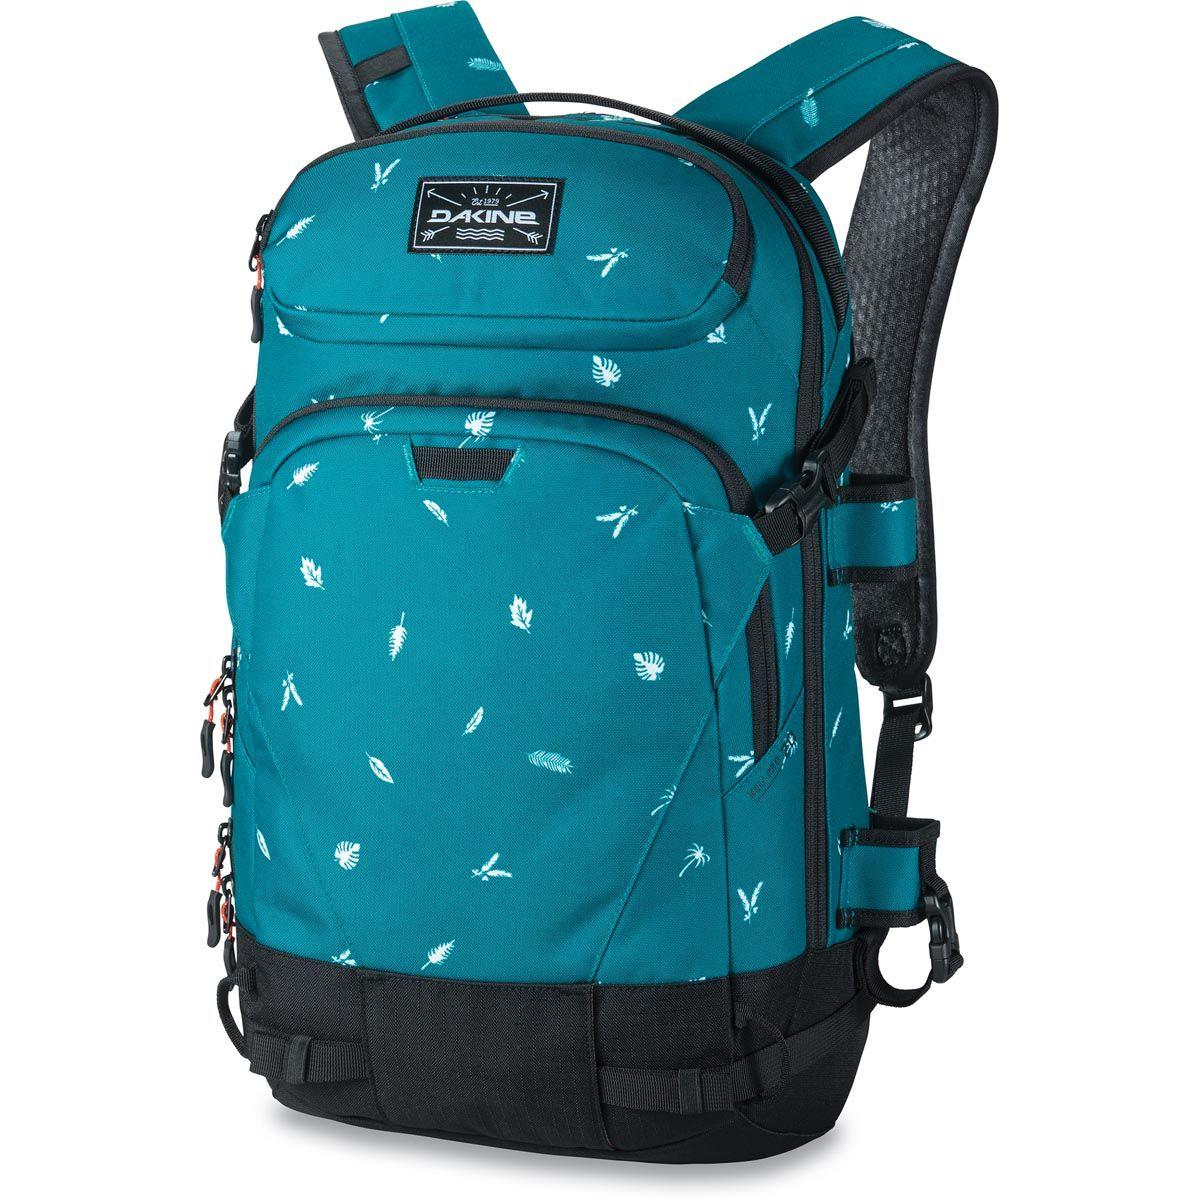 f4bd2f1060de Dakine Boot Pack - amazon.com. Element Equipment Boot Bag Snowboard Ski ...